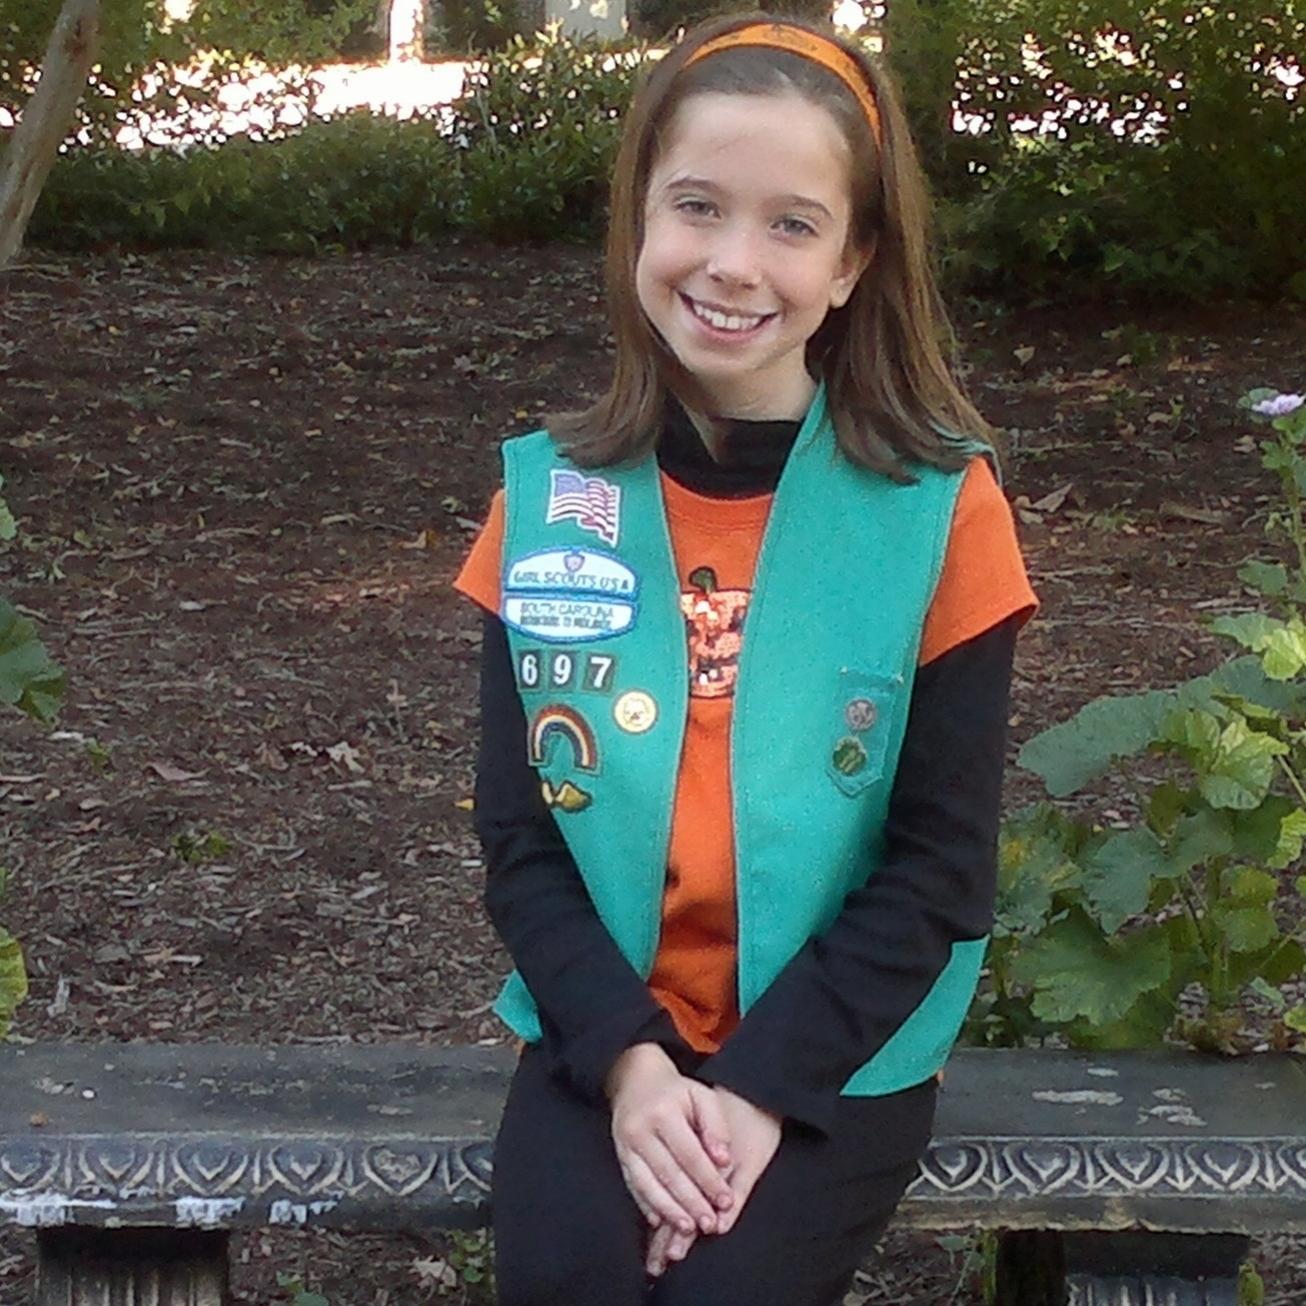 Bella as a Jr Girl Scout - October 2011